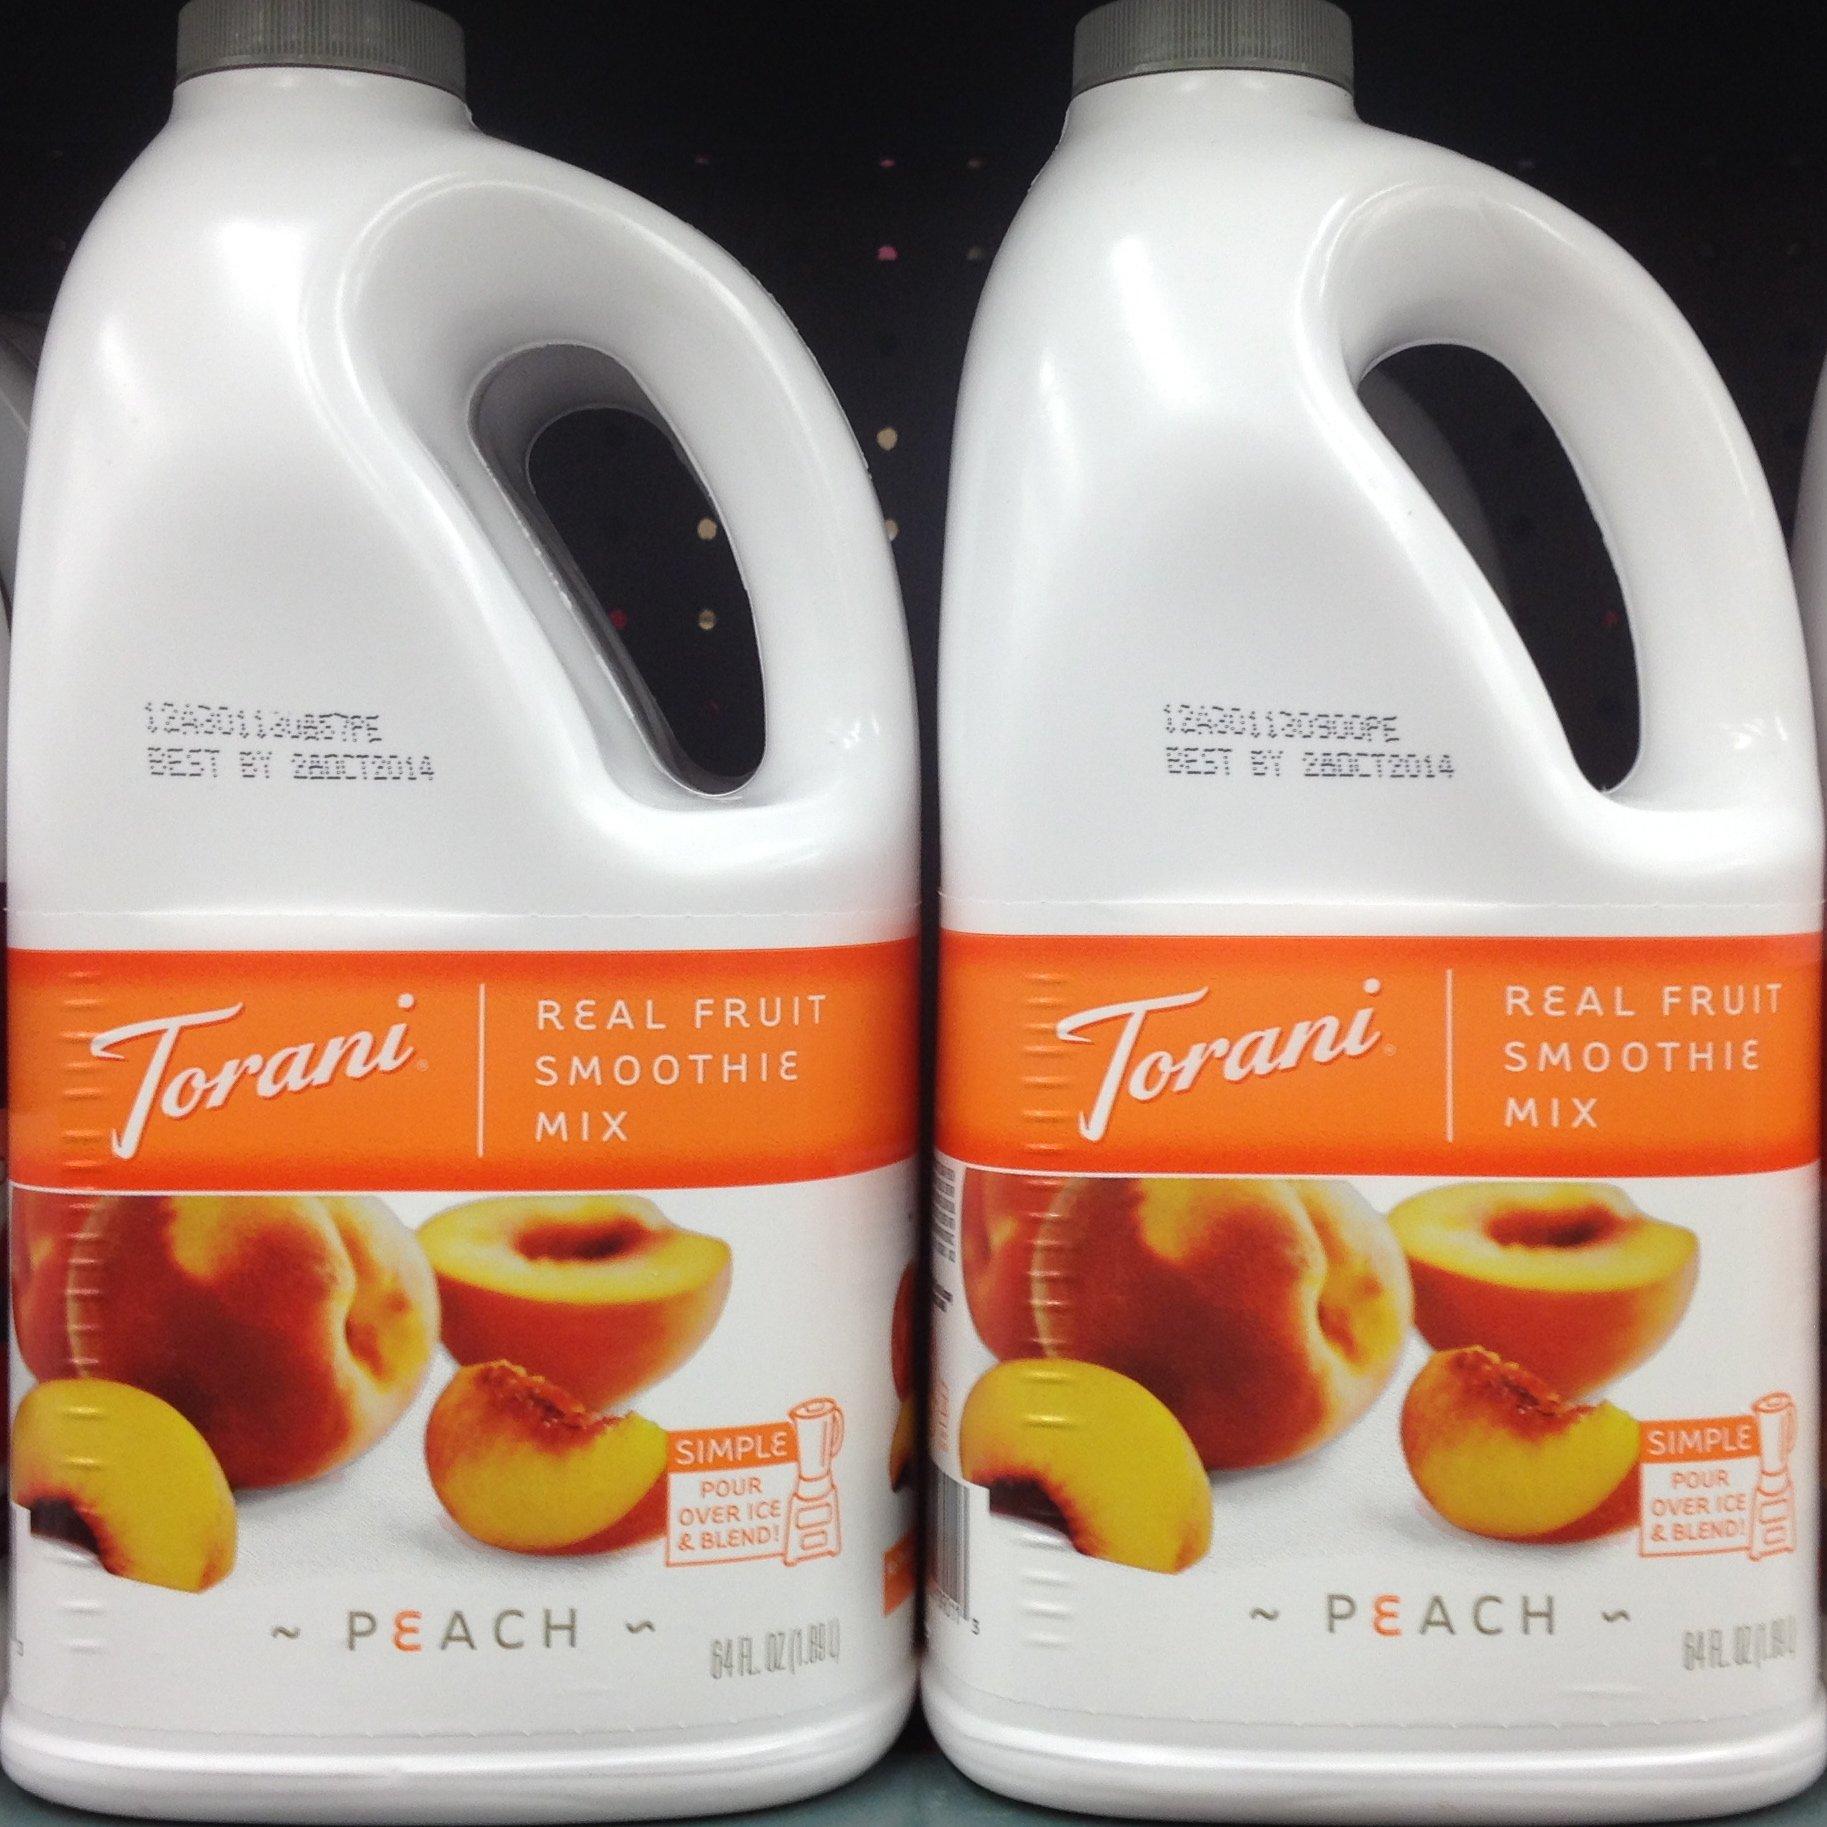 Torani Real Fruit Smoothie Mix PEACH 64oz (2 Pack) by Torani